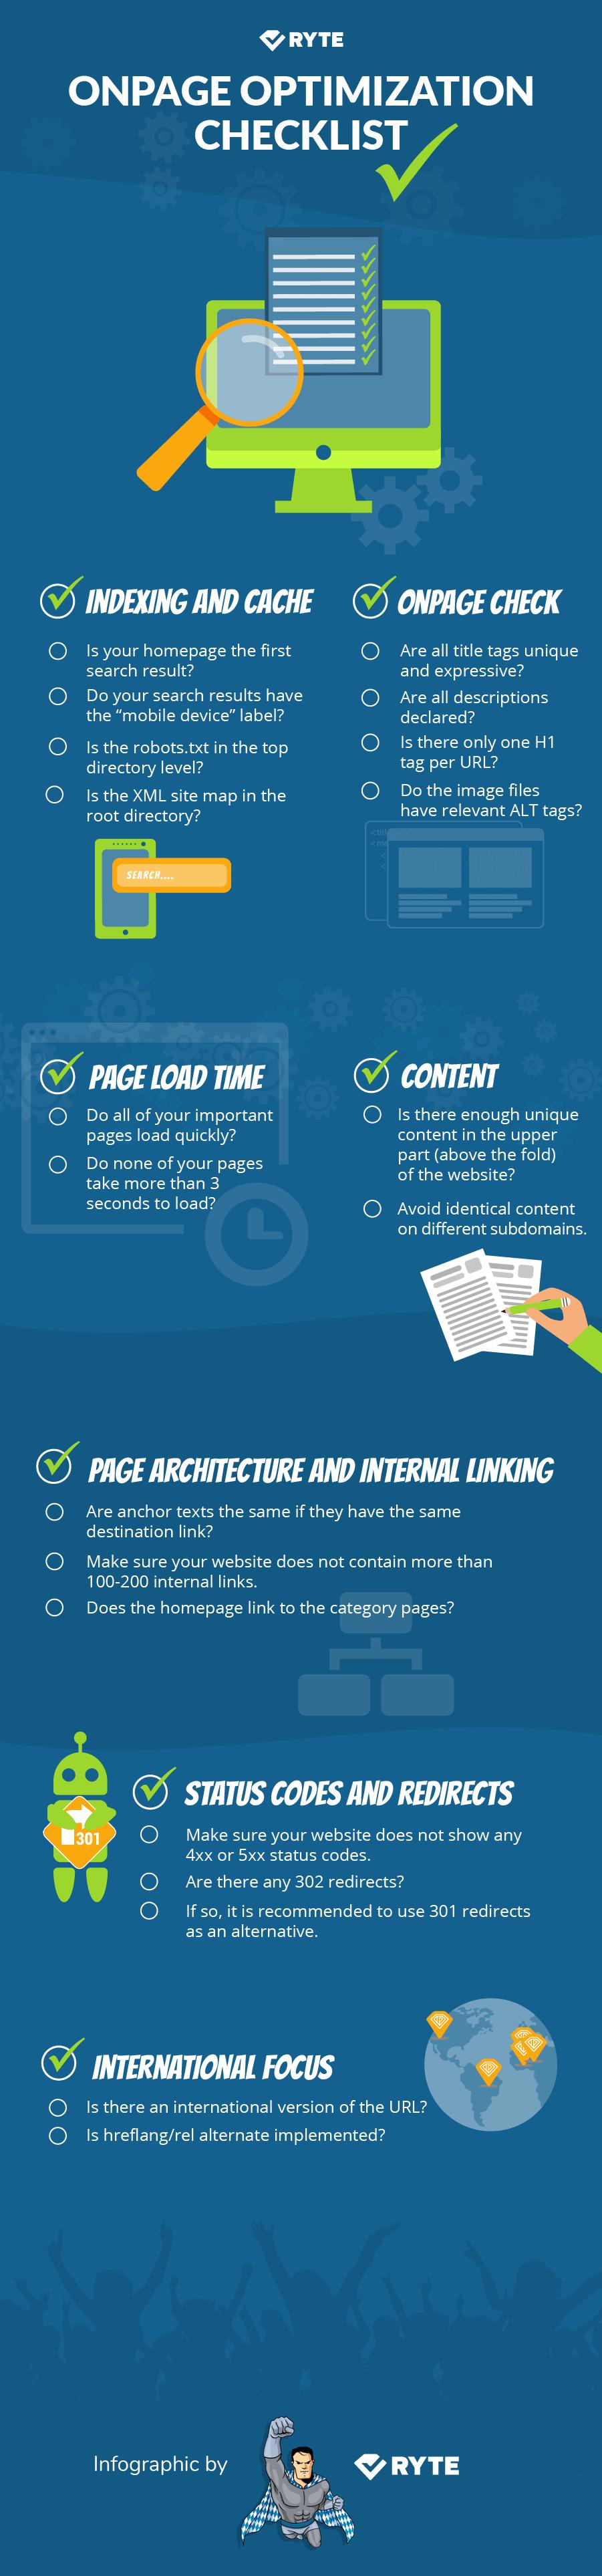 onpage-optimization-checklist OnPage Optimierung Infografik Checkliste